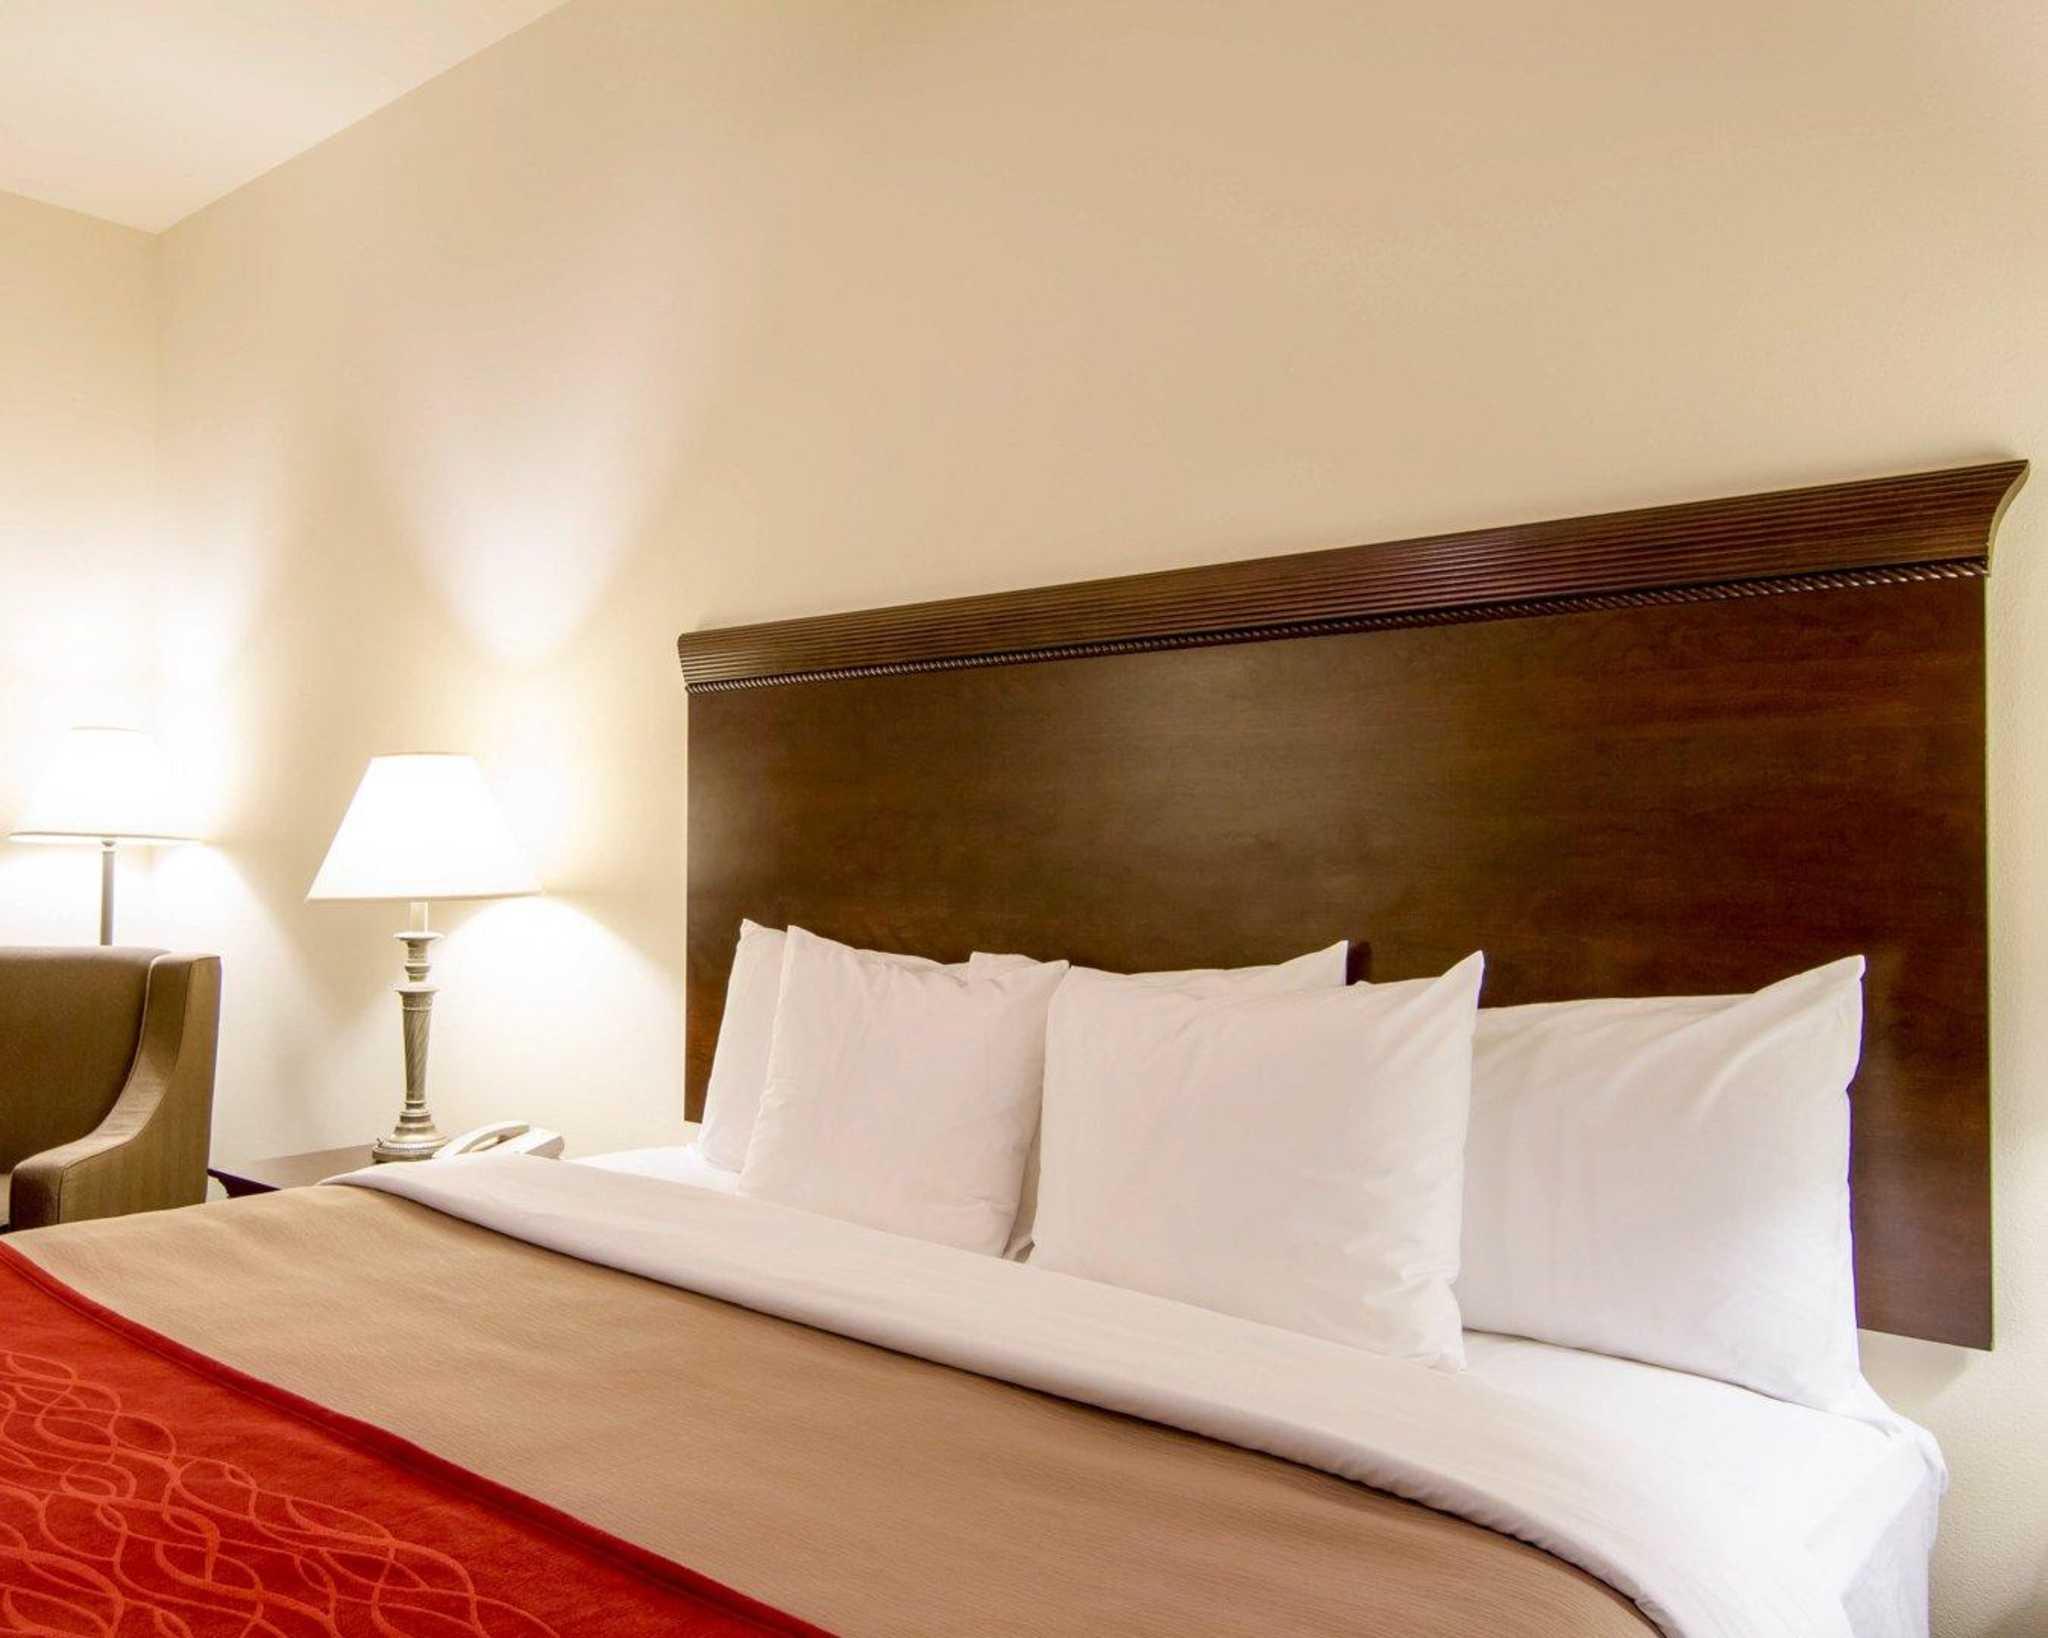 Comfort Inn & Suites Airport image 6